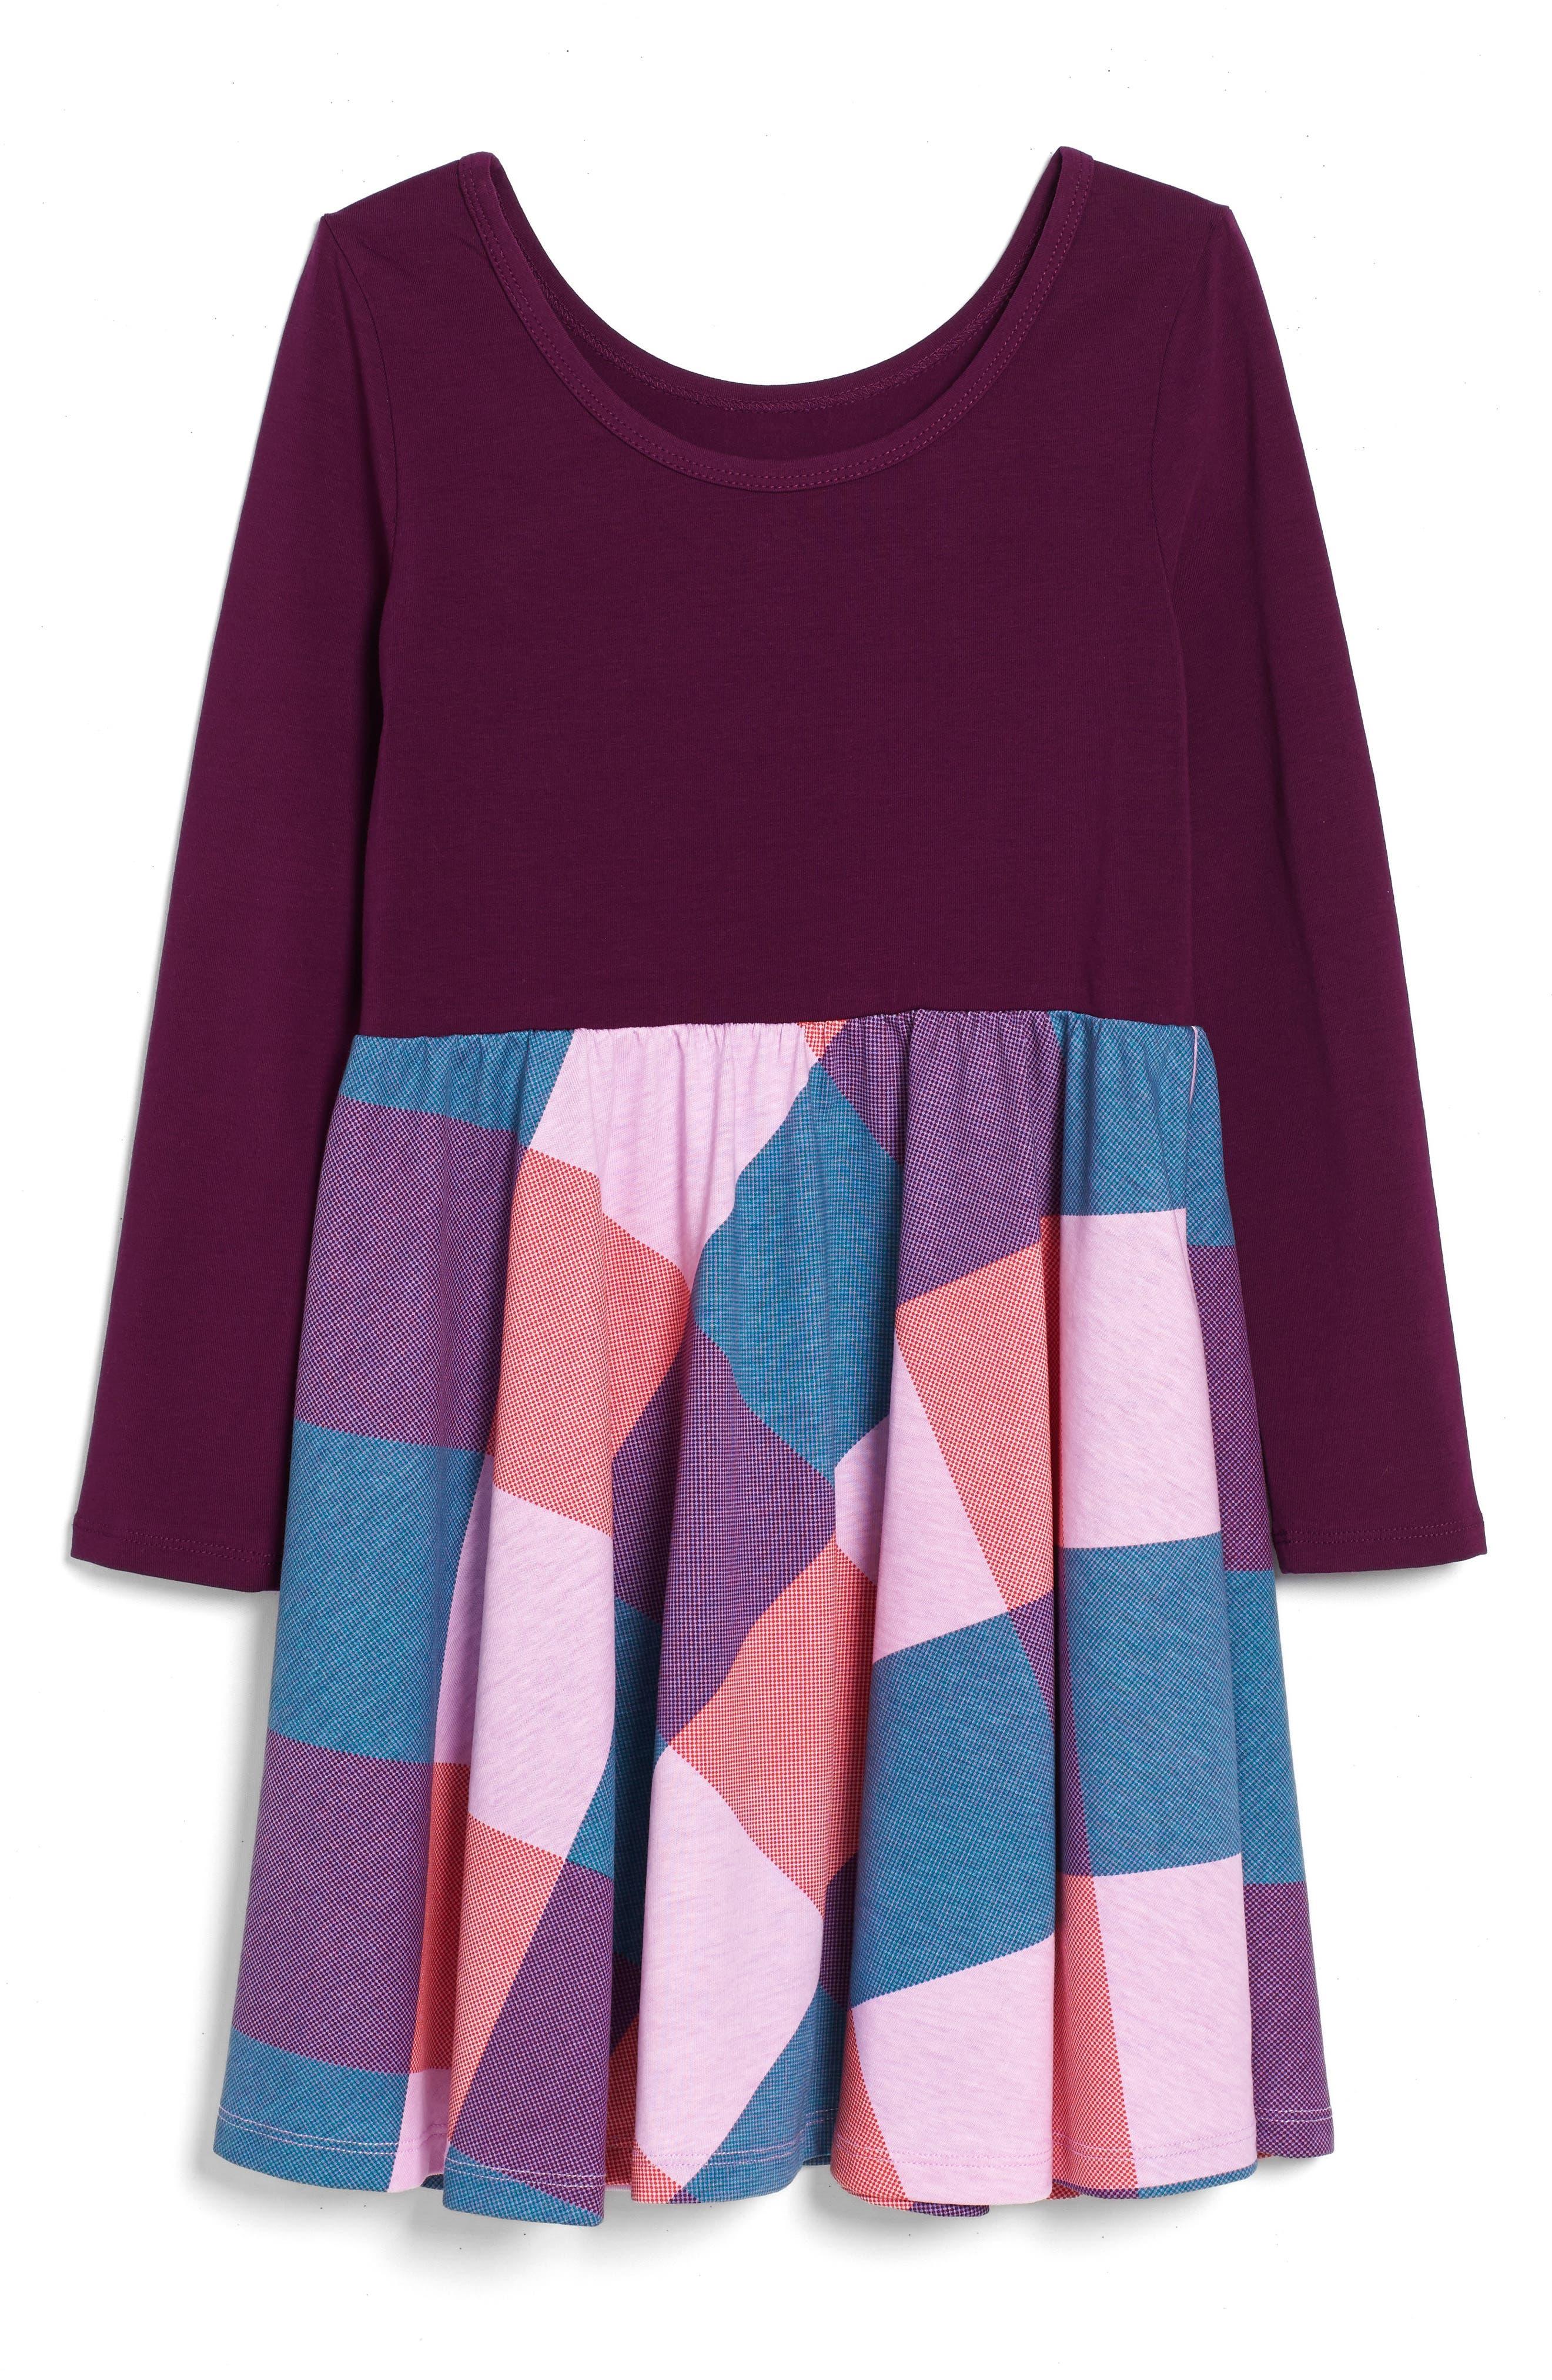 Alternate Image 2  - Tea Collection Dahlia Skirted Dress (Toddler Girls, Little Girls & Big Girls)